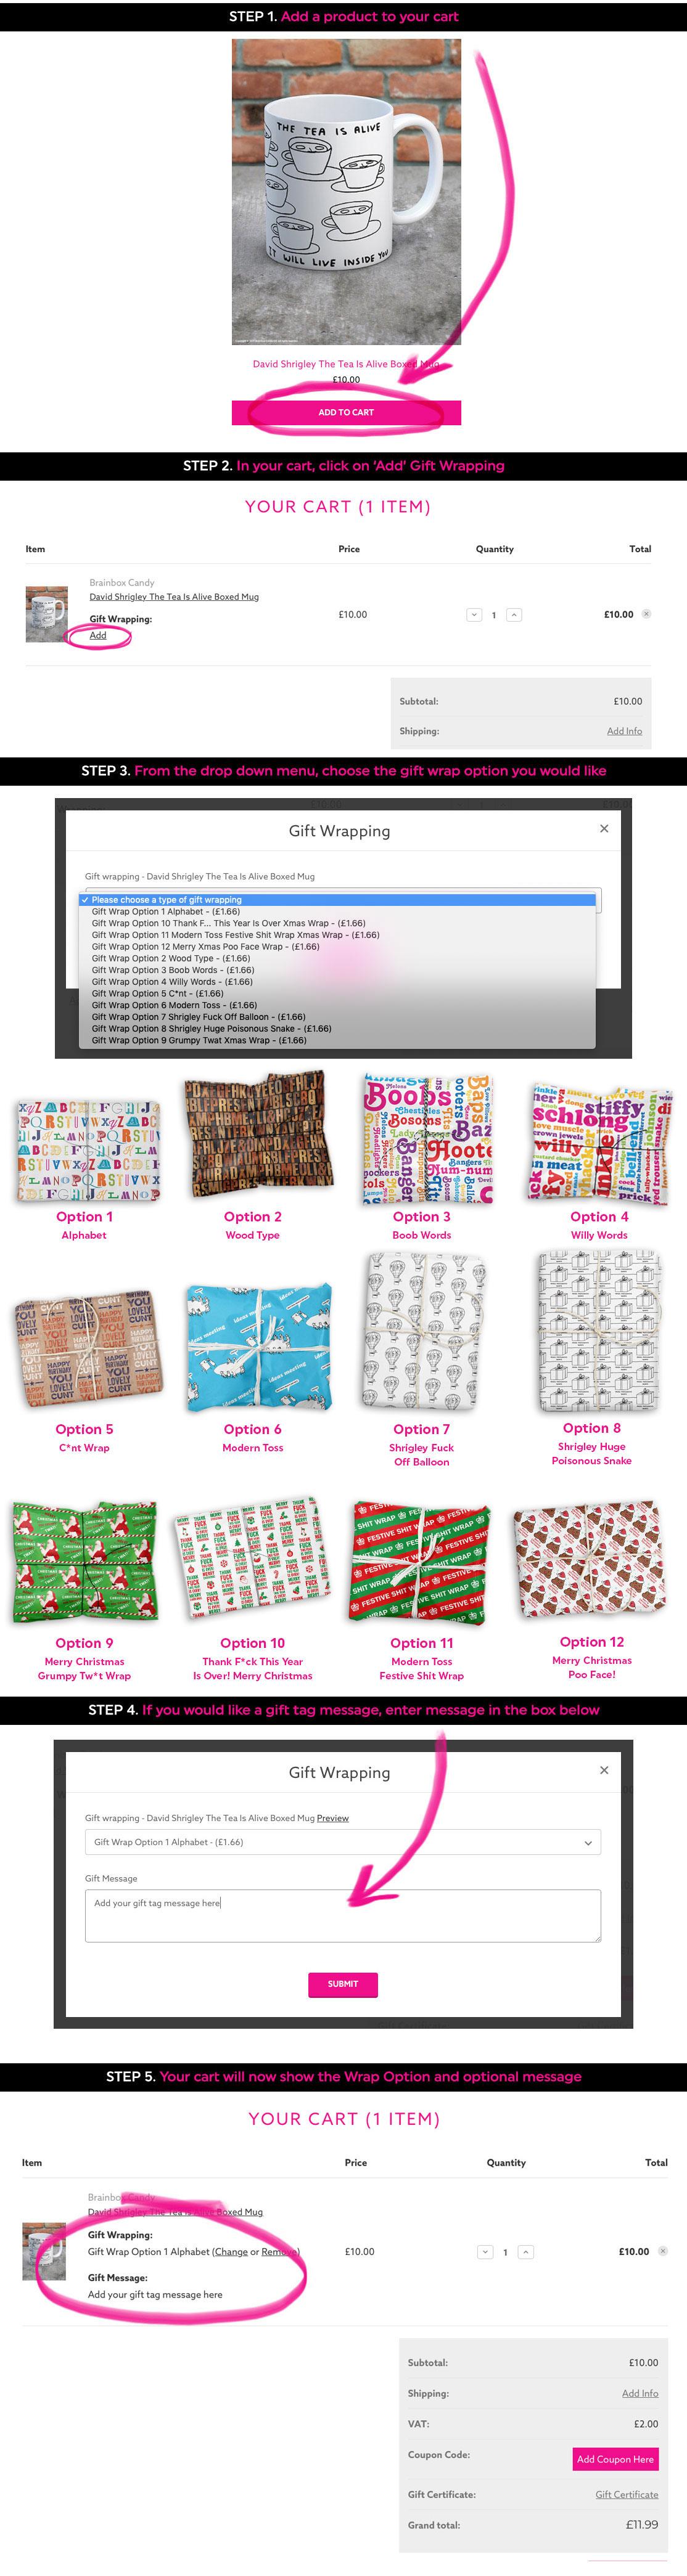 gift-wrap-instructionsnew2.jpg